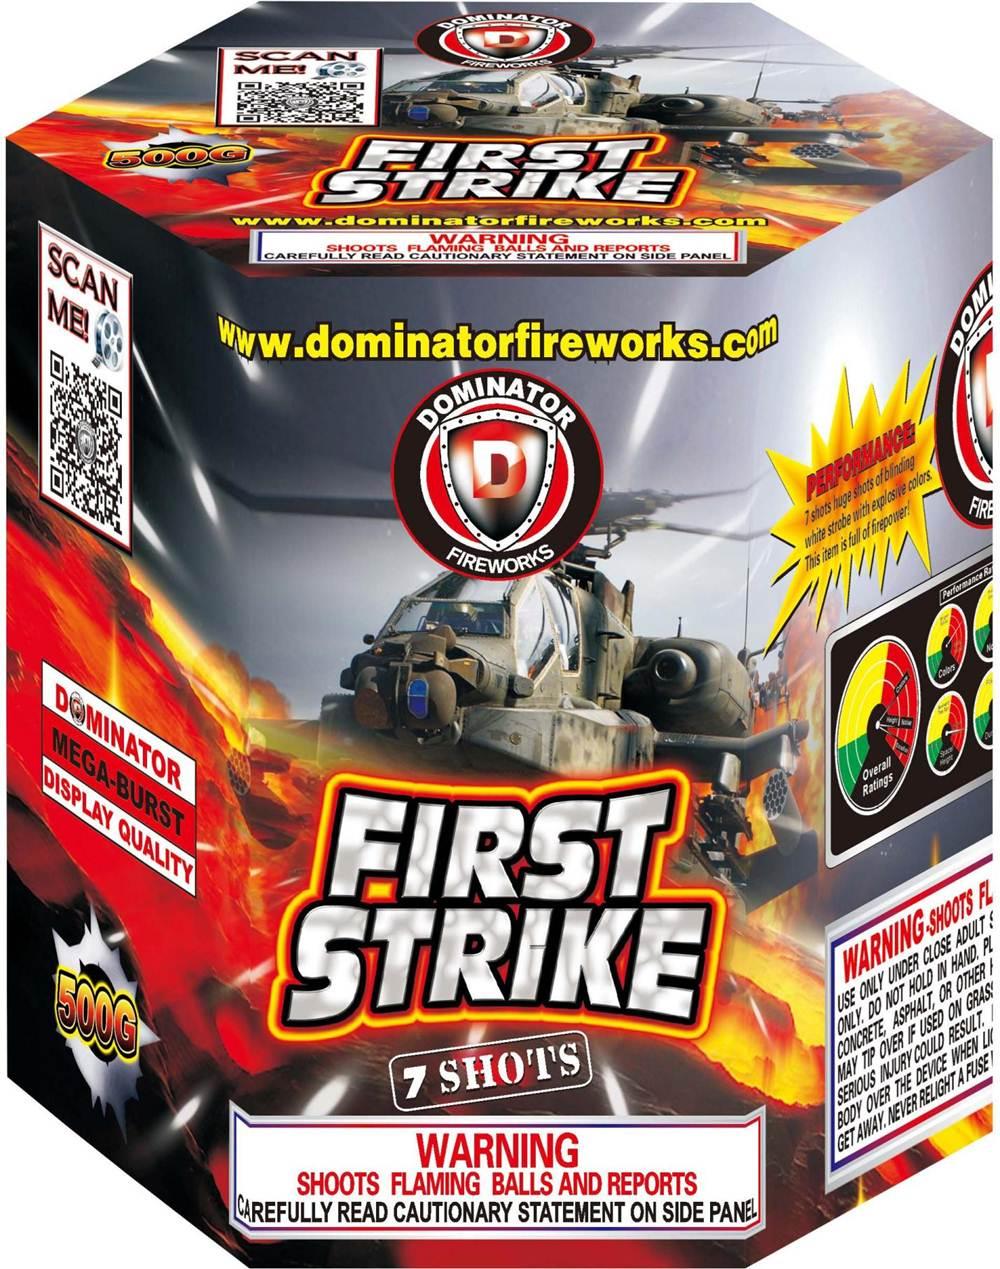 DM501 First Strike Dominator Brand Fireworks - Multi-Shot